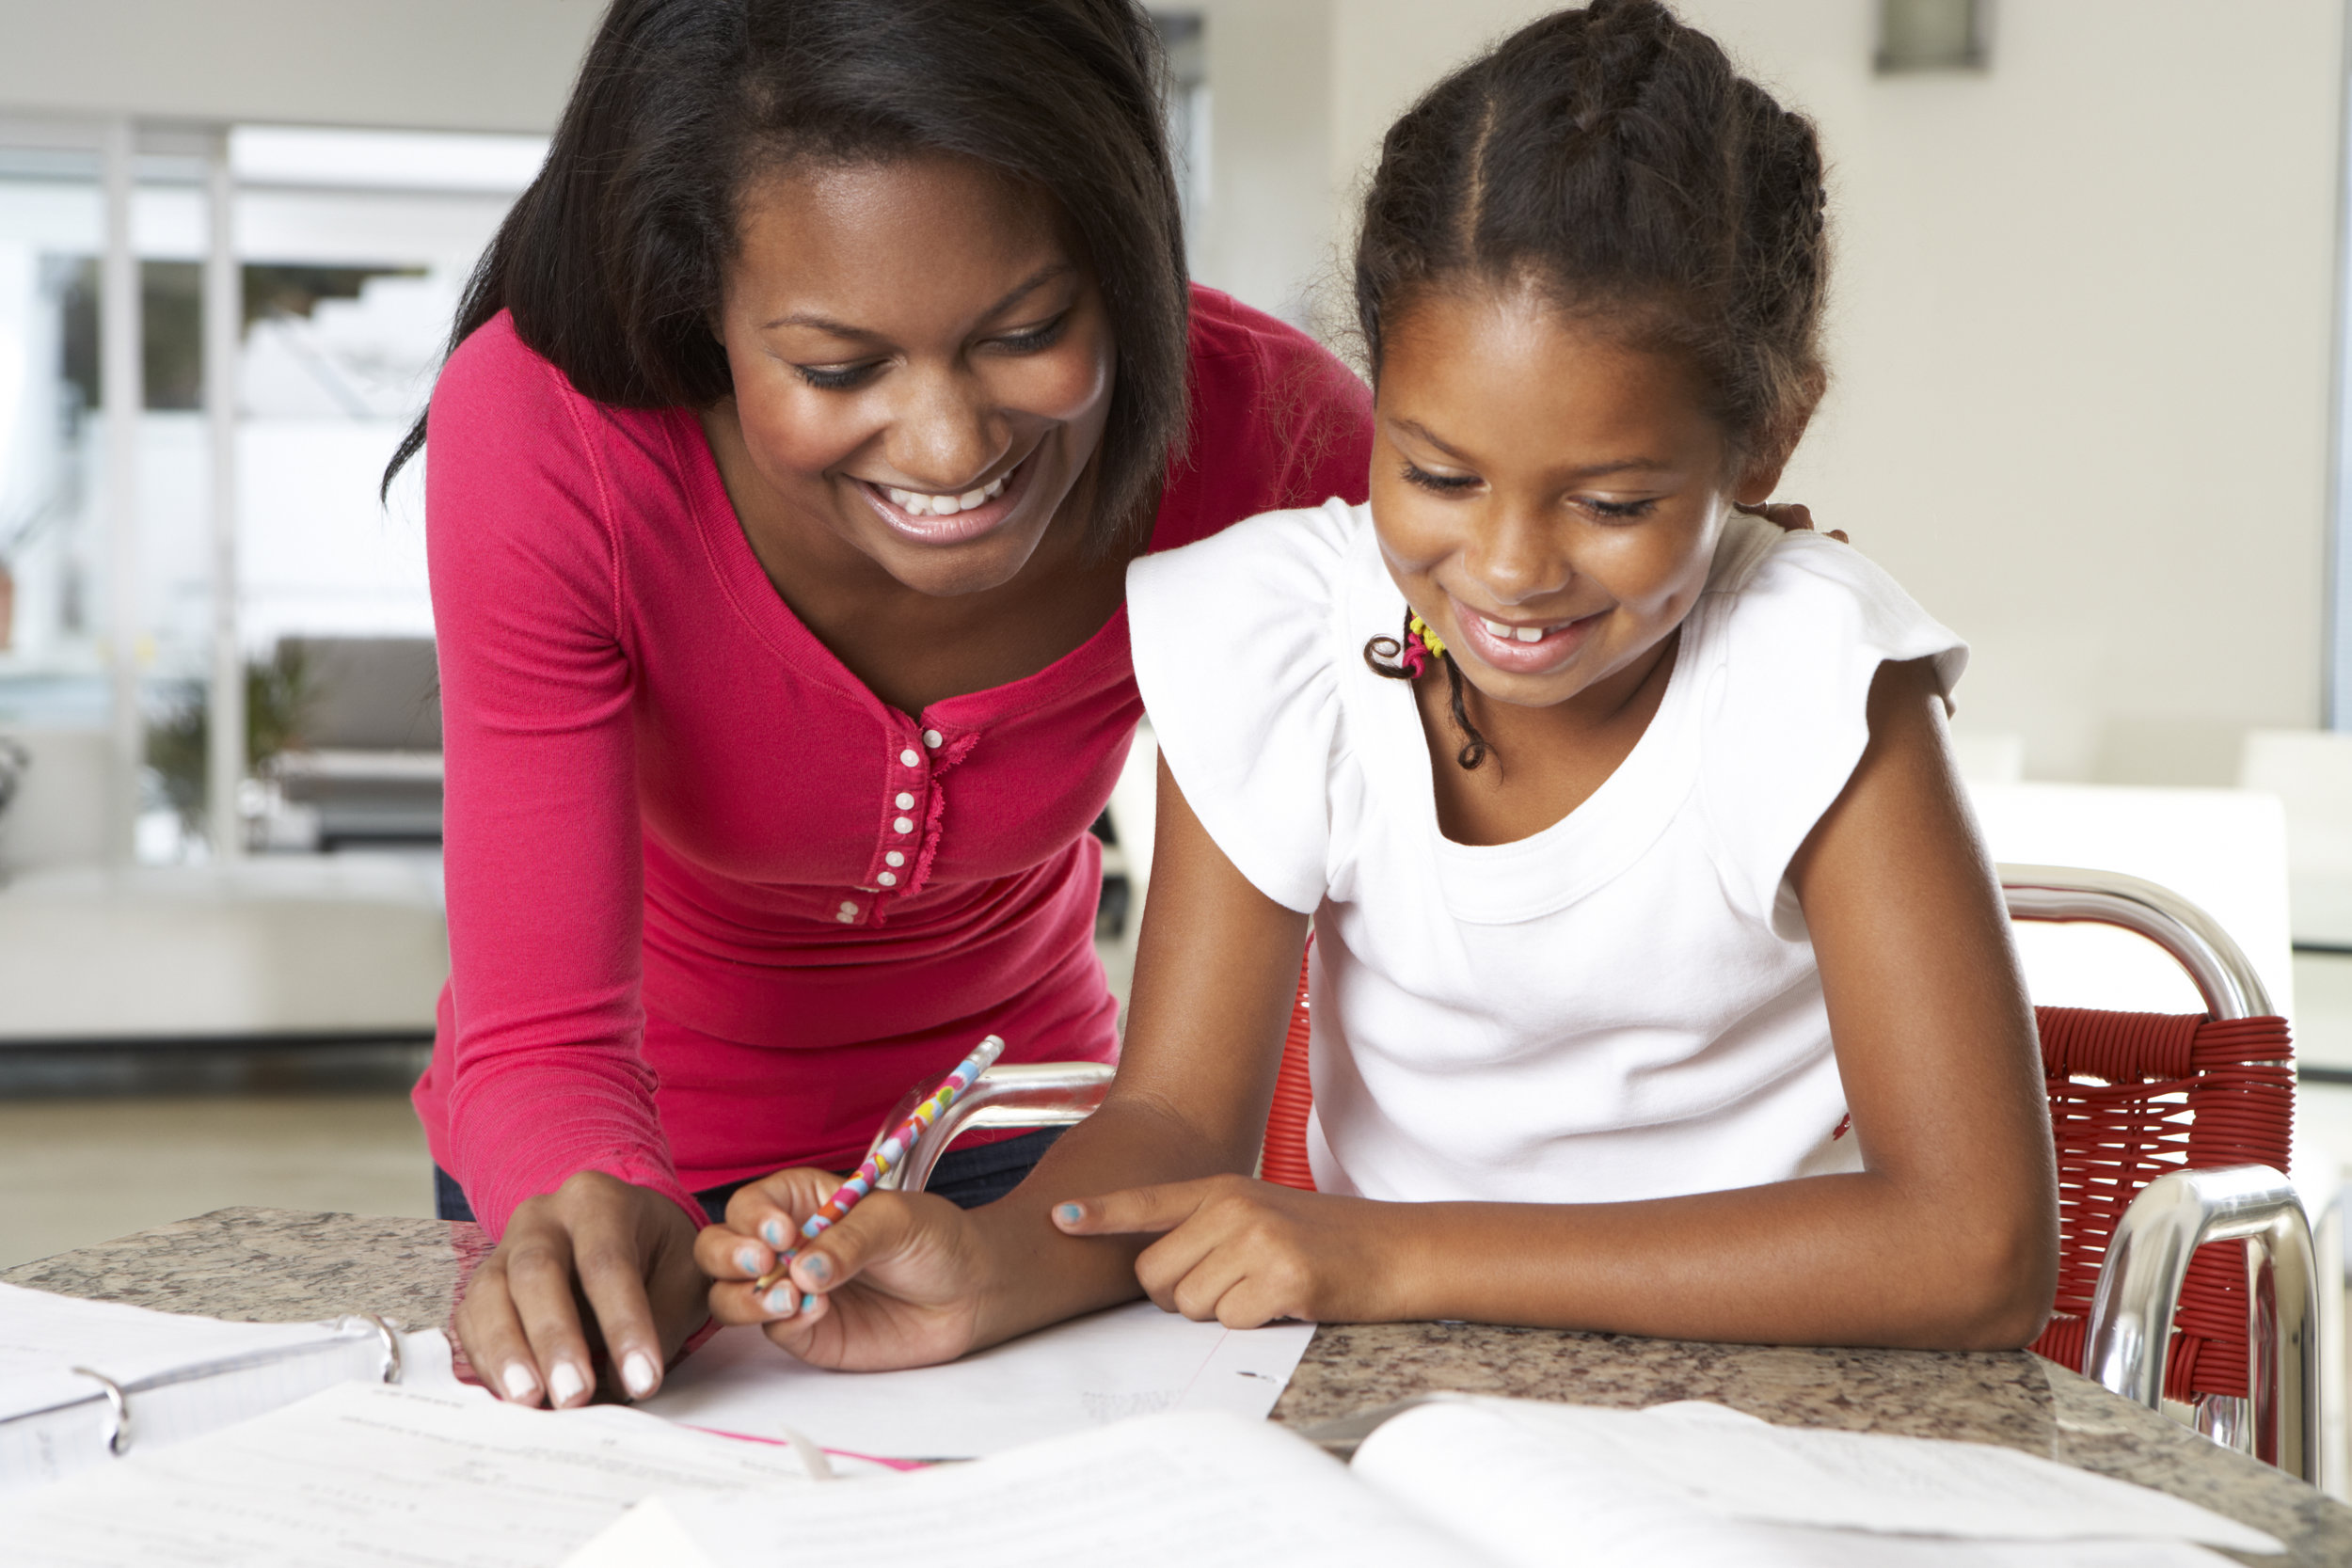 AA mom & daughter doing homework.jpg